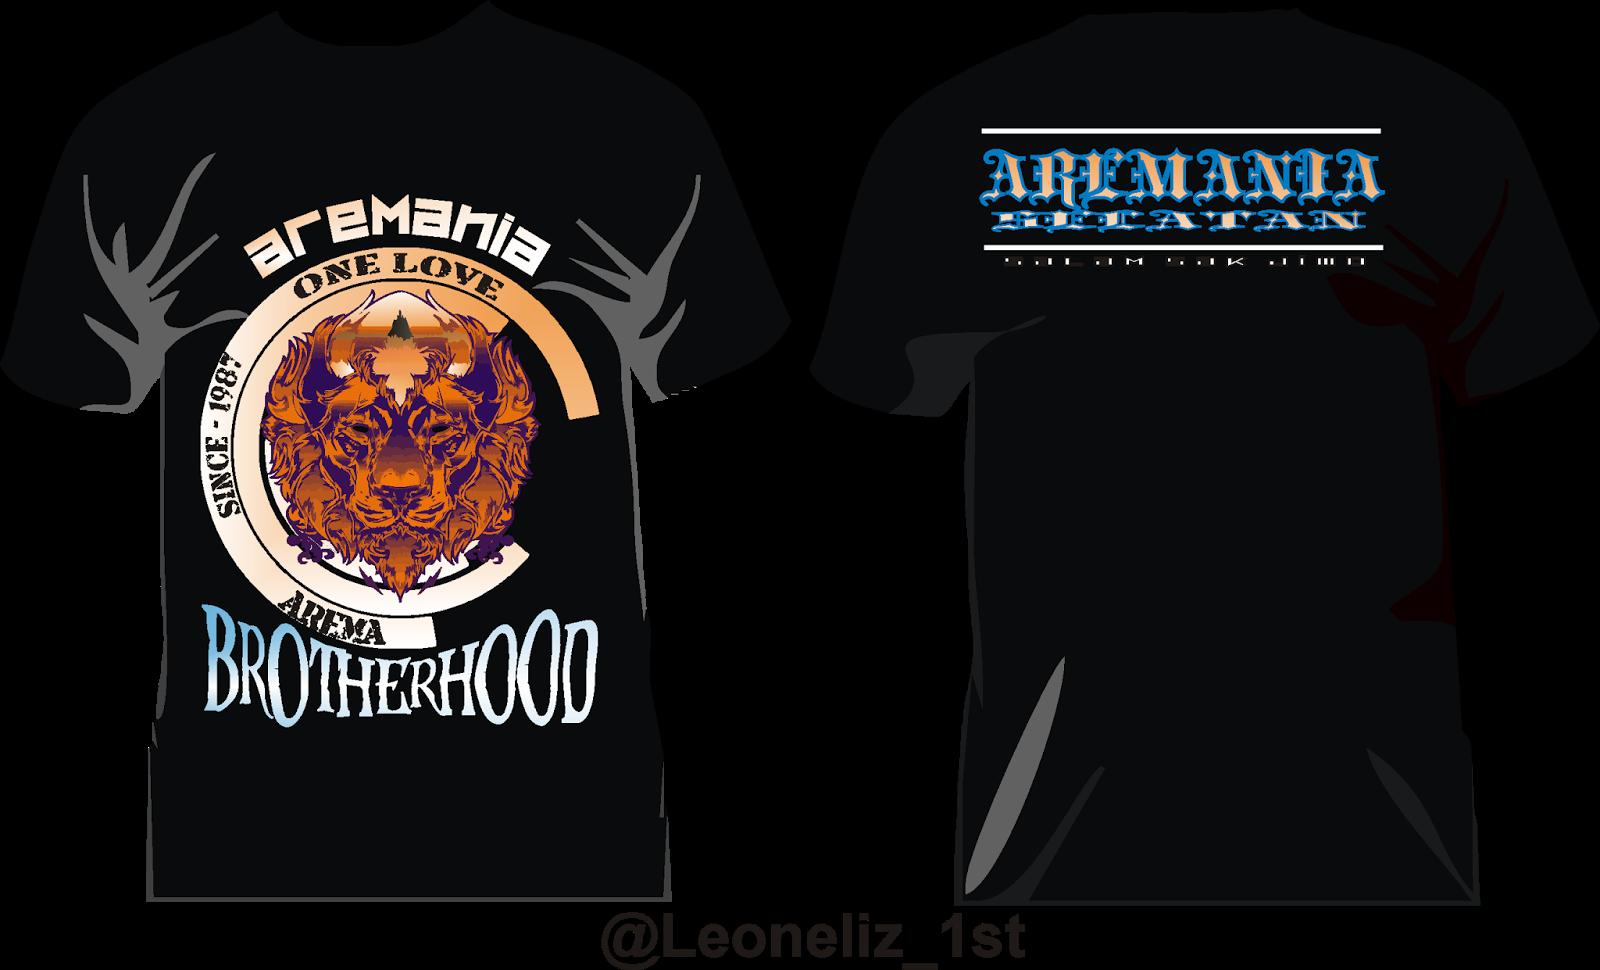 Contoh desain t shirt kelas - Design Baju Aremania 2016